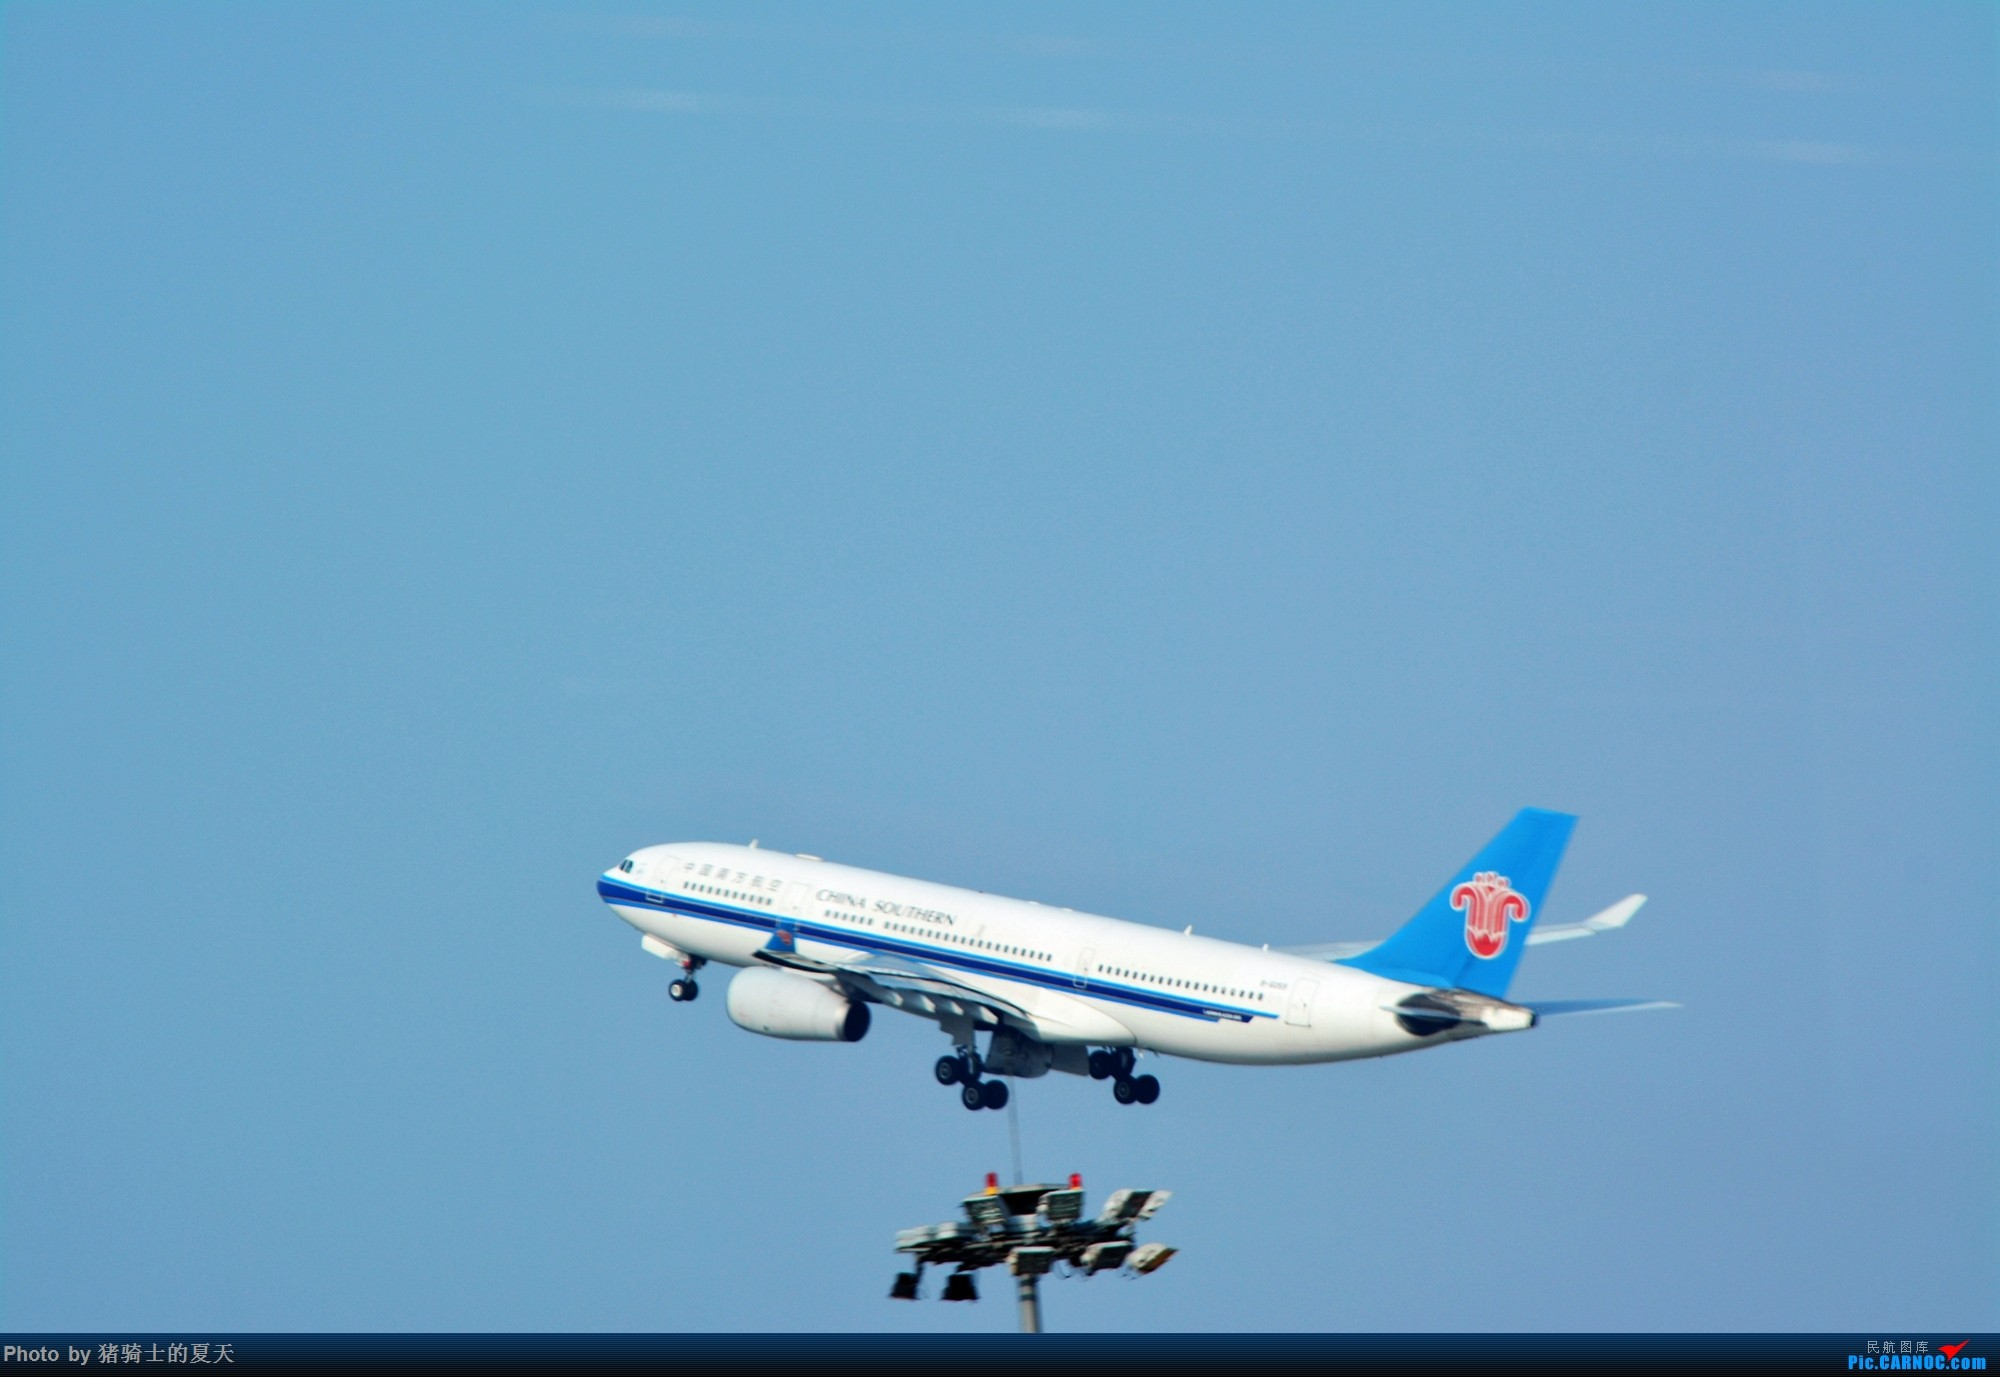 Re:[原创]2017年鸡鸭图 AIRBUS A330-200 B-6059 中国上海虹桥国际机场